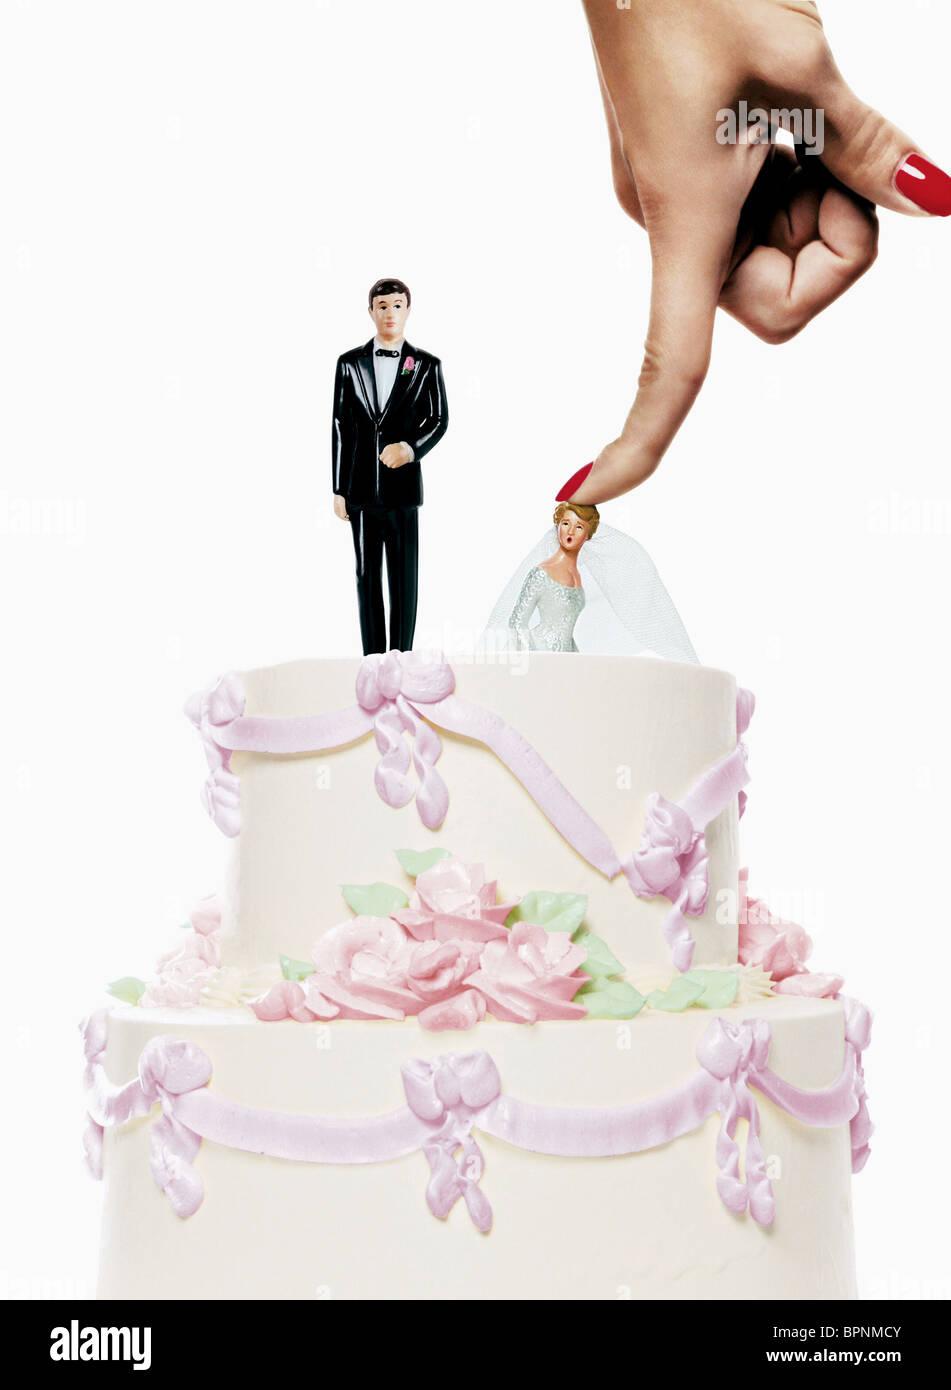 Gâteau de mariage MONSTER-IN-LAW; MONSTER EN DROIT (2005) Photo Stock